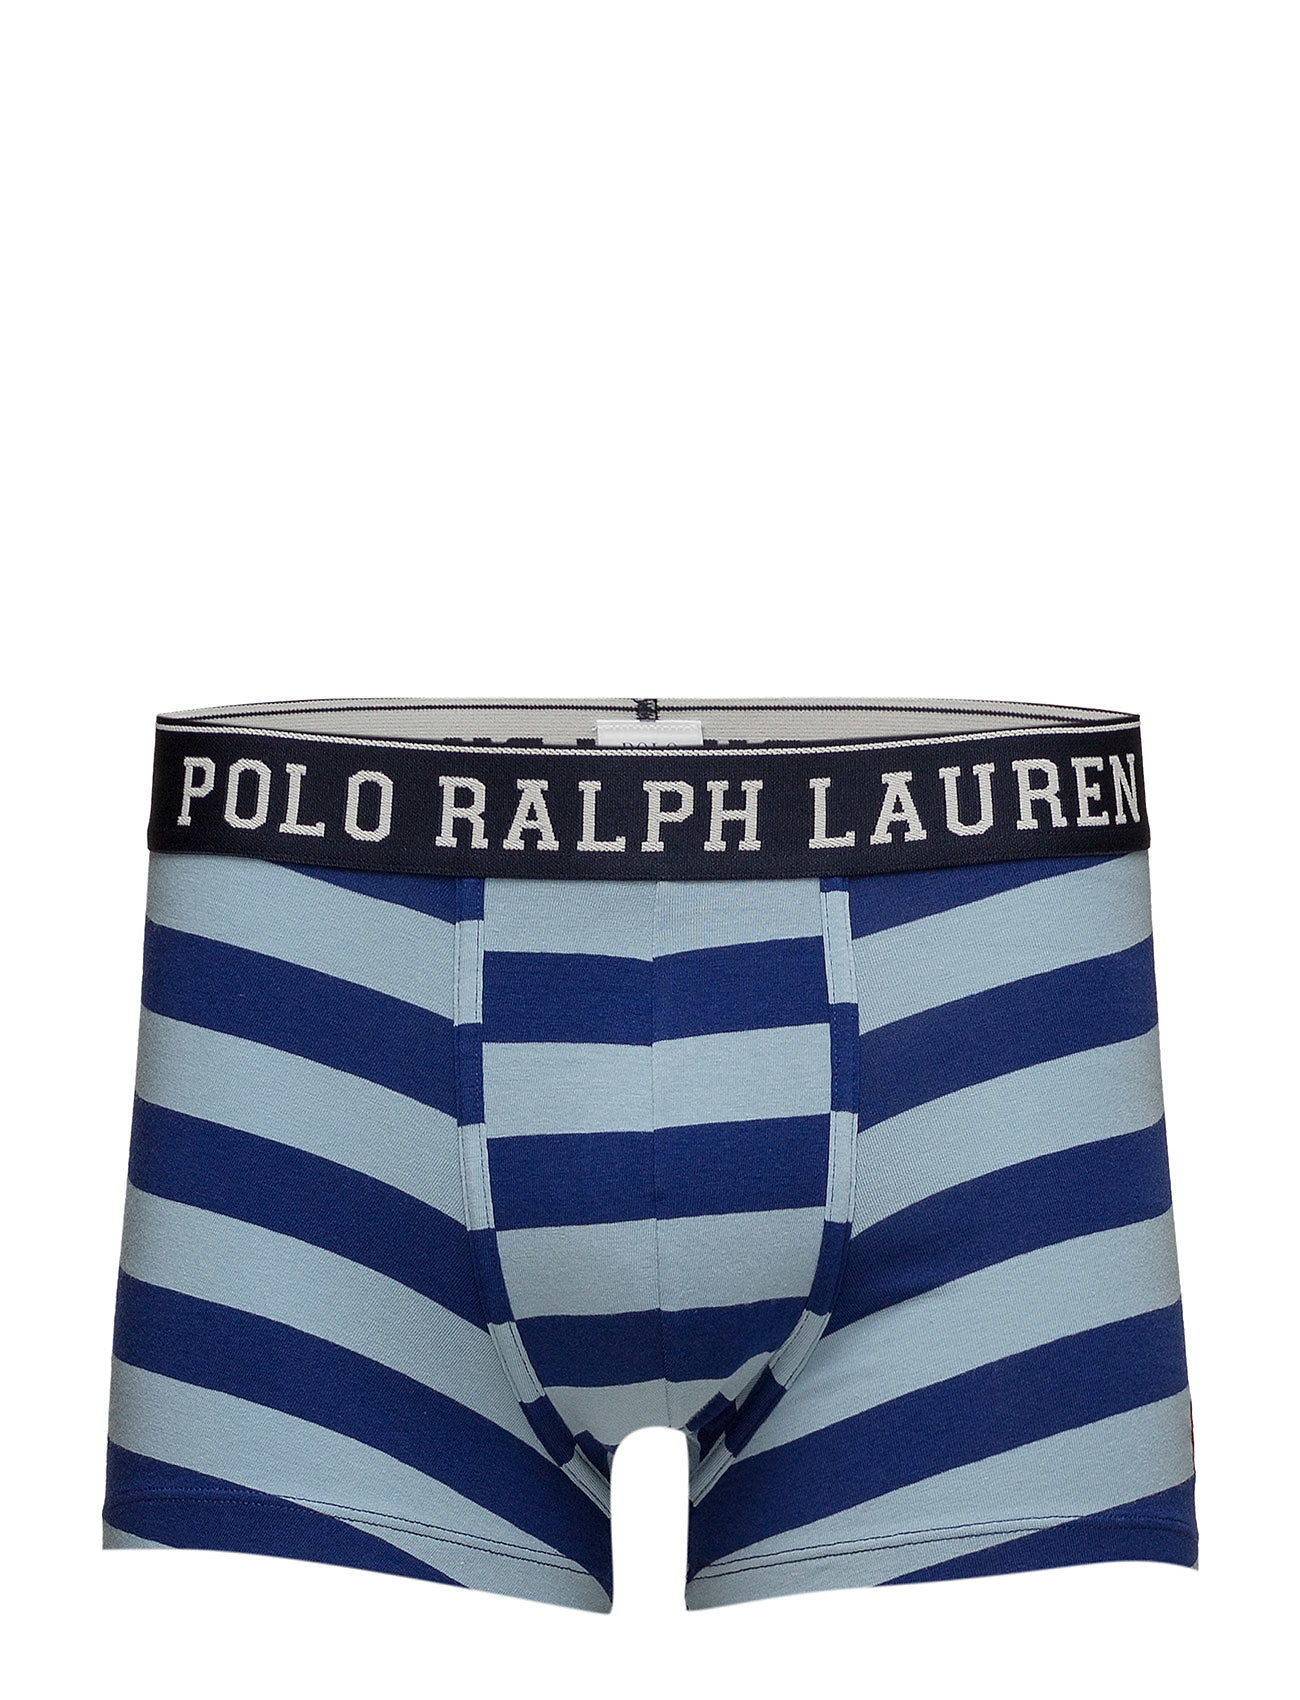 c7e8da5d8c Striped Cotton Trunk (Sporting Royal St) (£13.50) - Polo Ralph ...